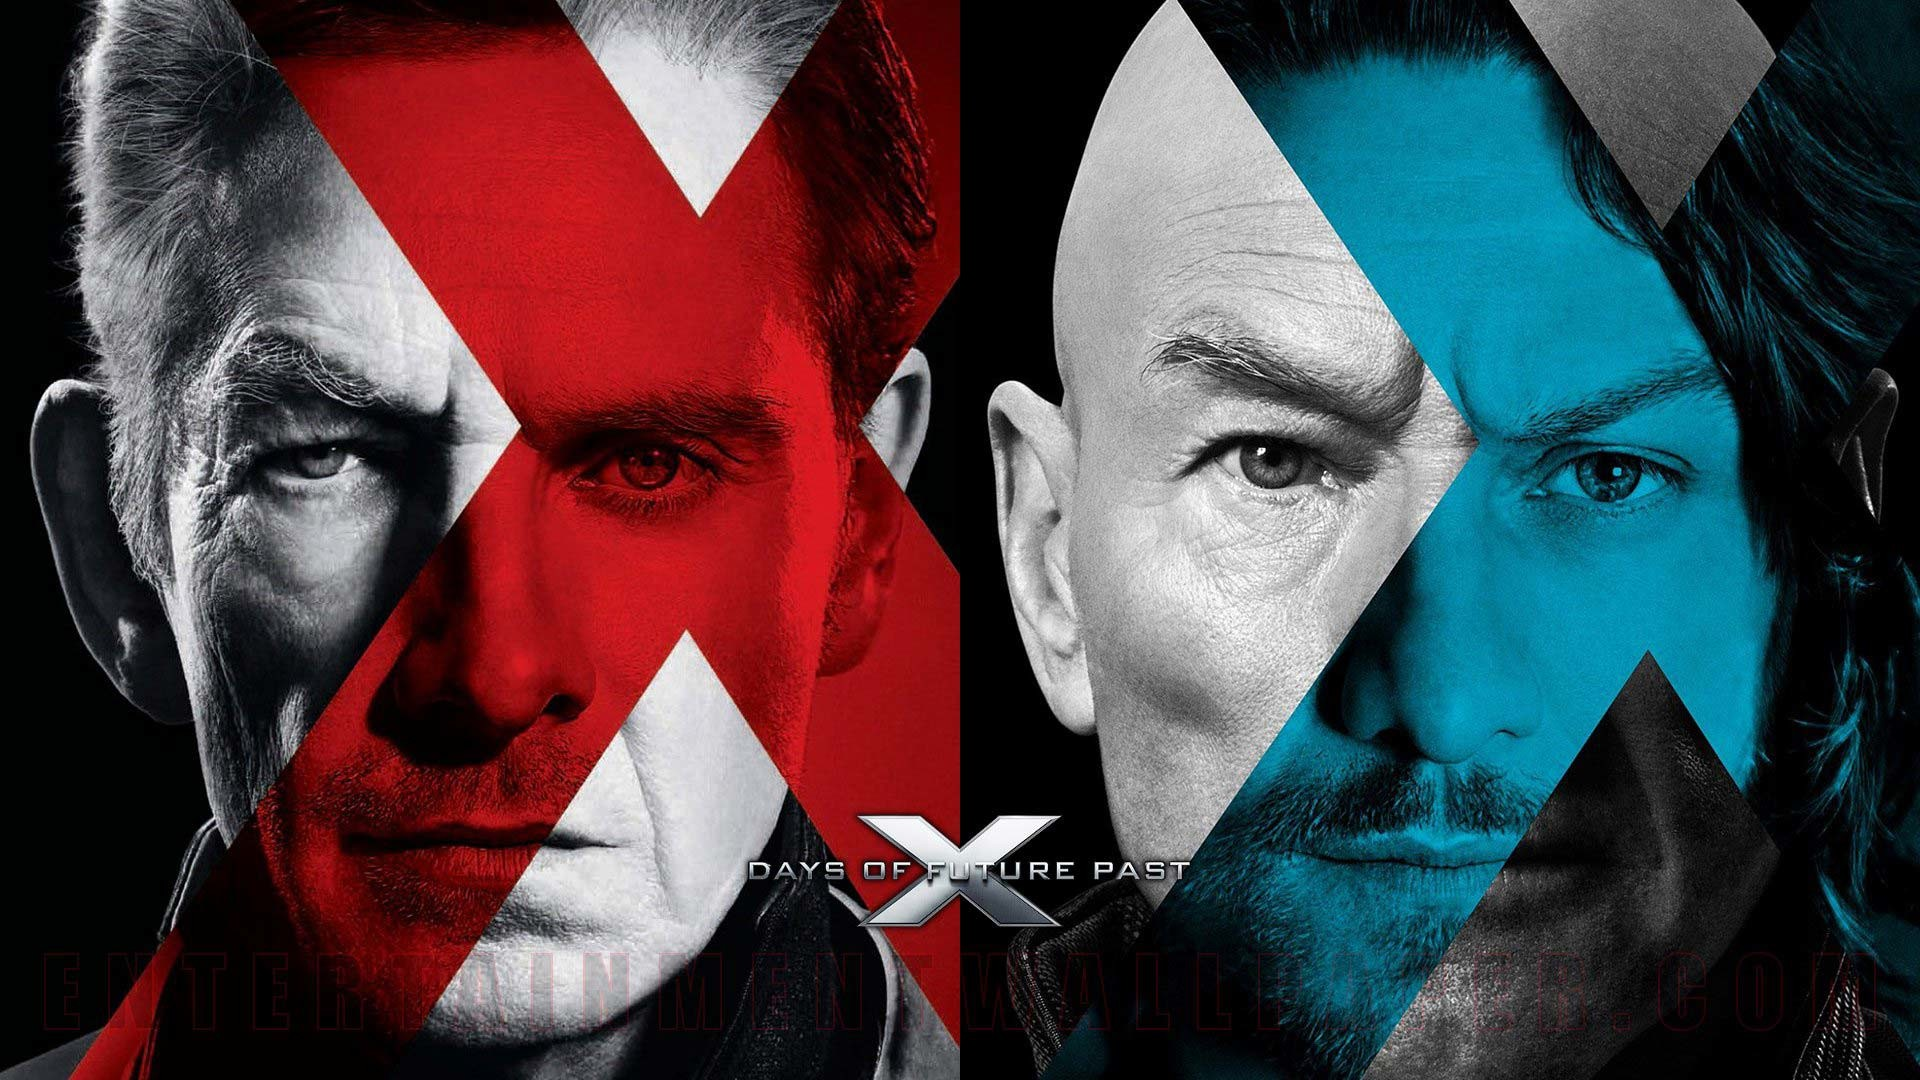 magneto-x-men-days-future-past-movie-wallpapers-